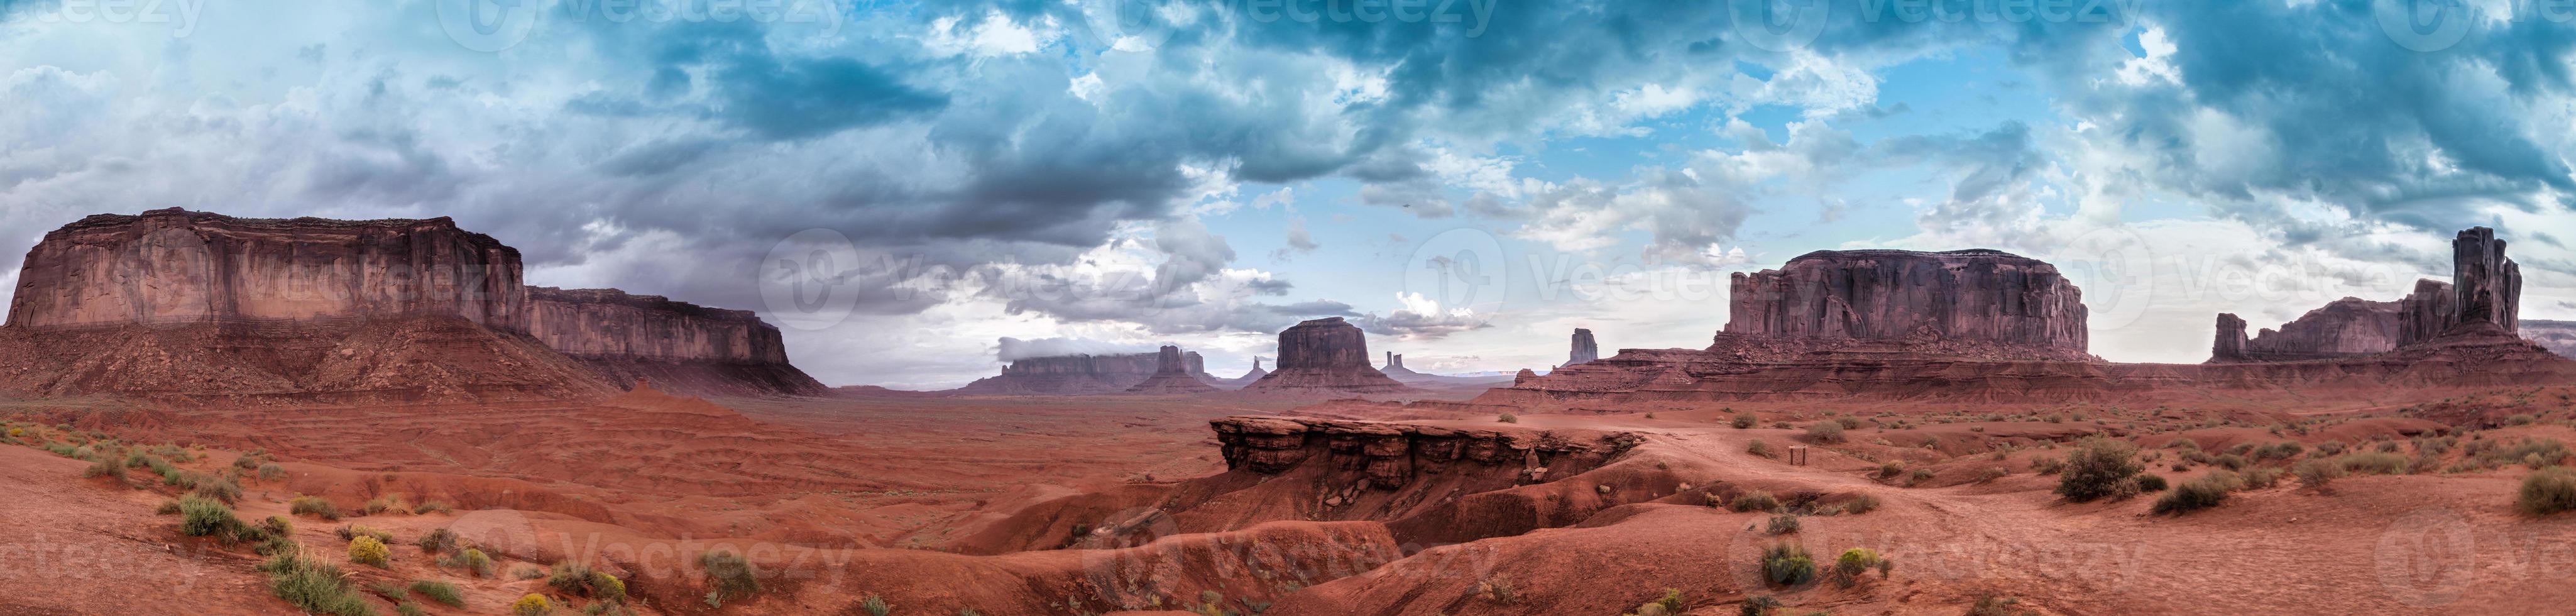 Monument Valley Panorama Skyline foto